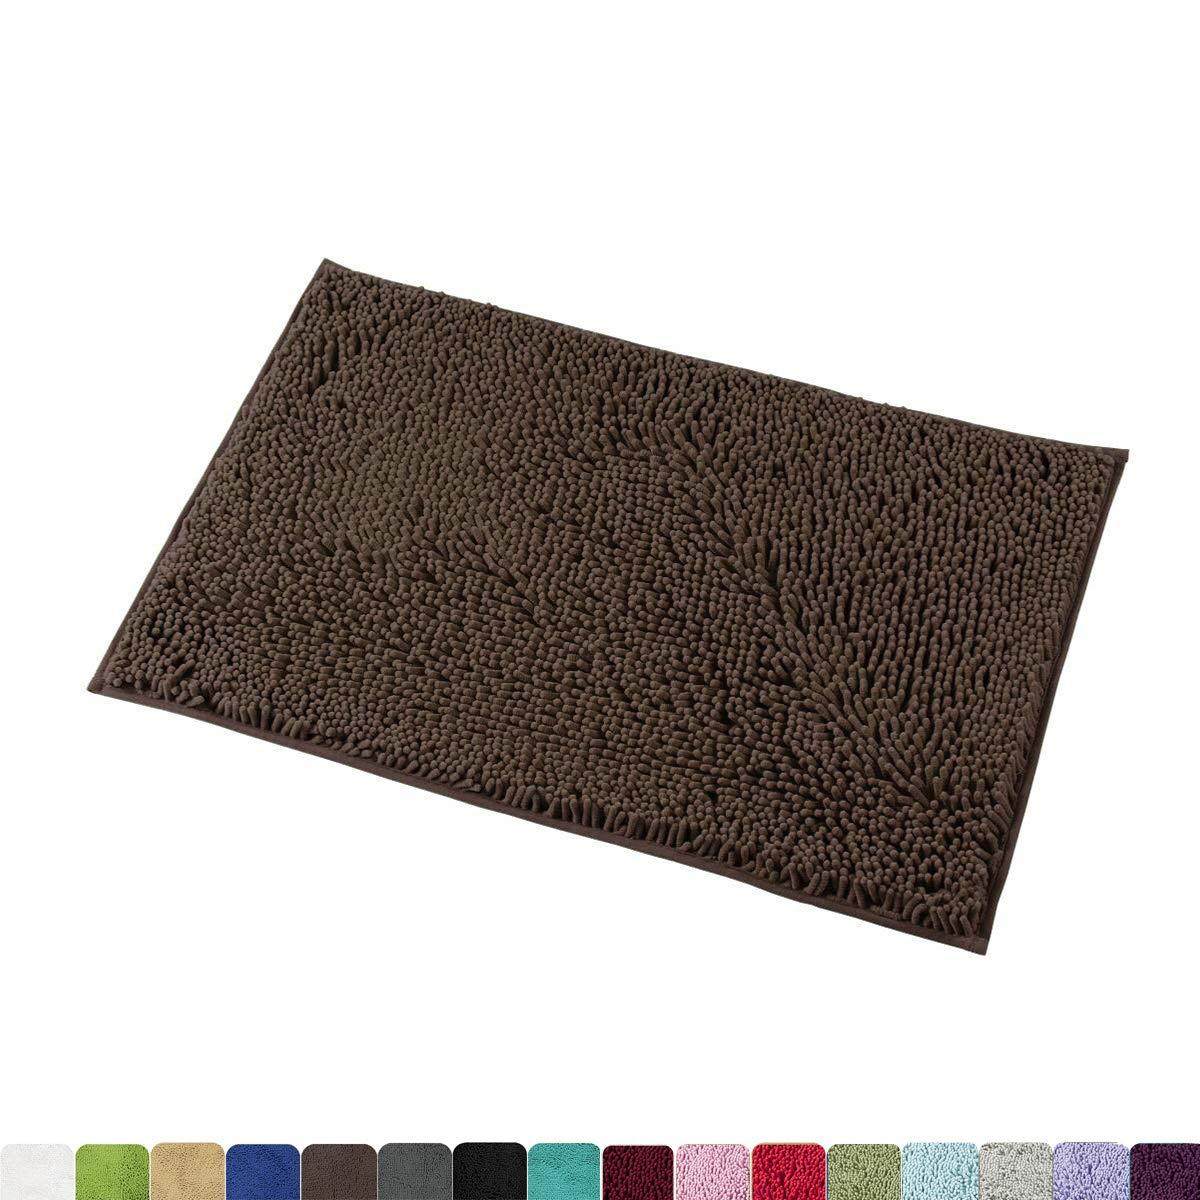 MAYSHINE 20x32 inch Non-Slip Bathroom Rug Shag Shower Mat Machine-Washable Bath mats Water Absorbent Soft Microfibers Brown